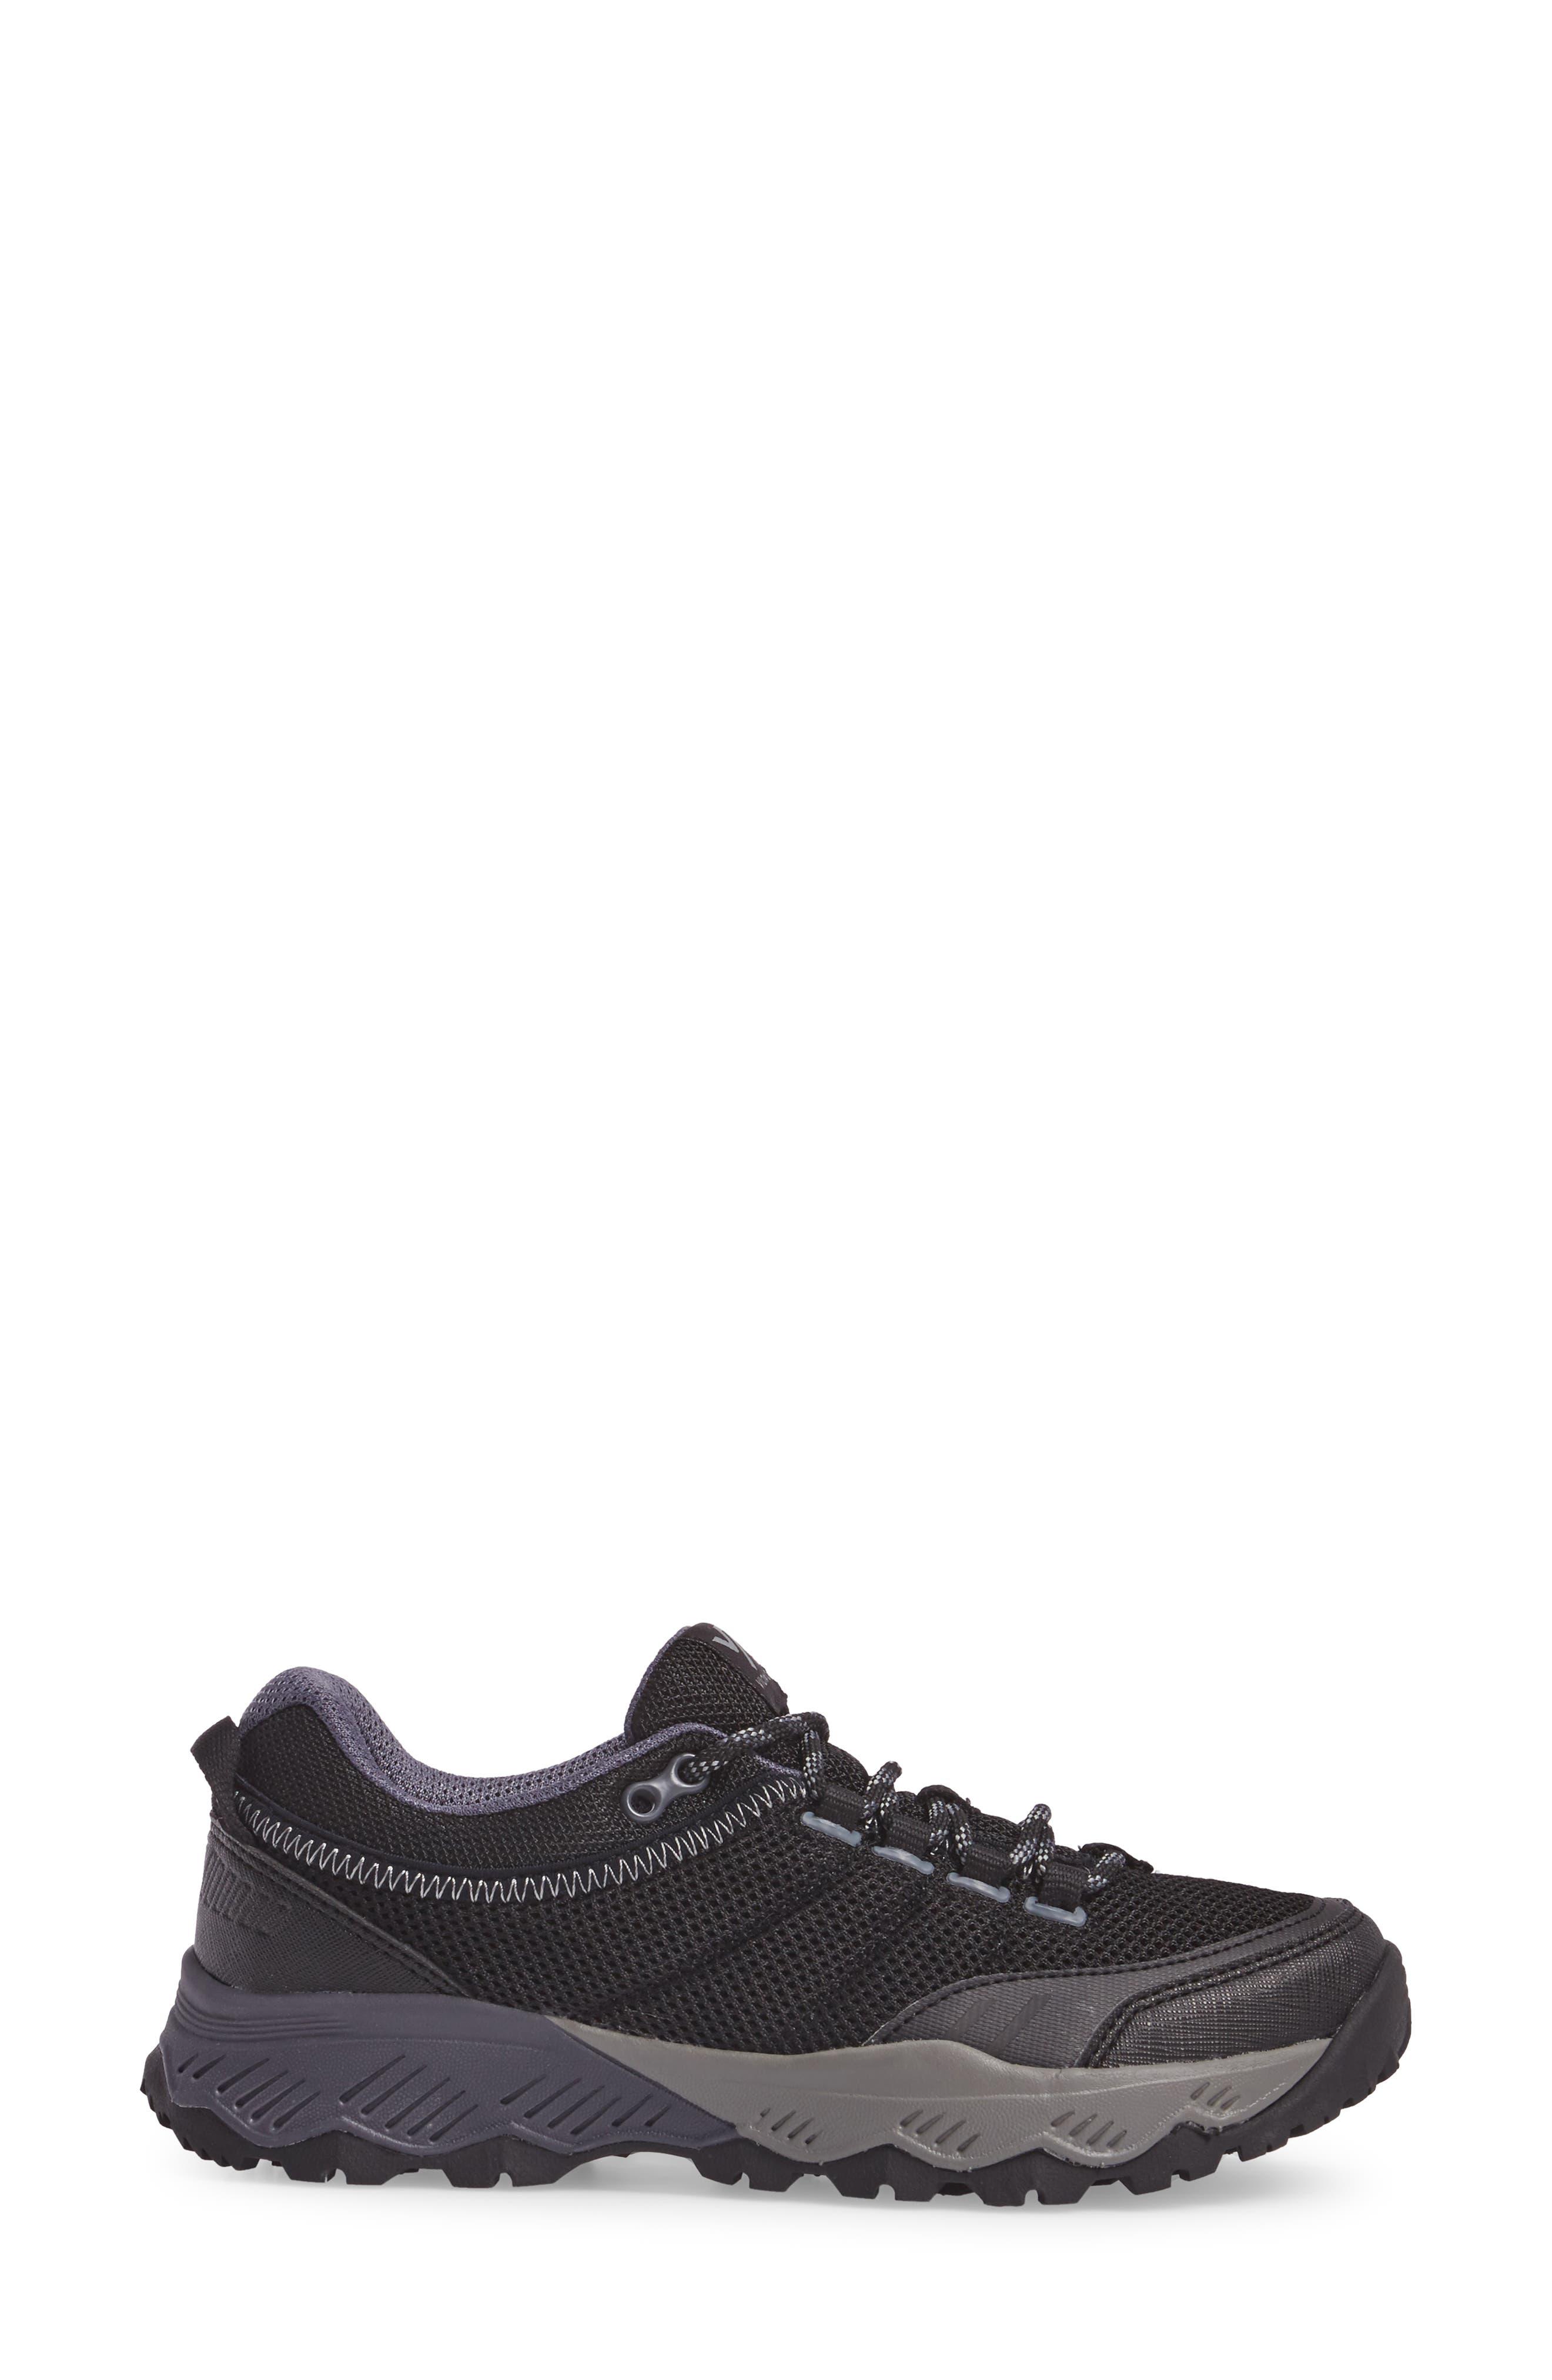 Mckinley Sneaker,                             Alternate thumbnail 3, color,                             001